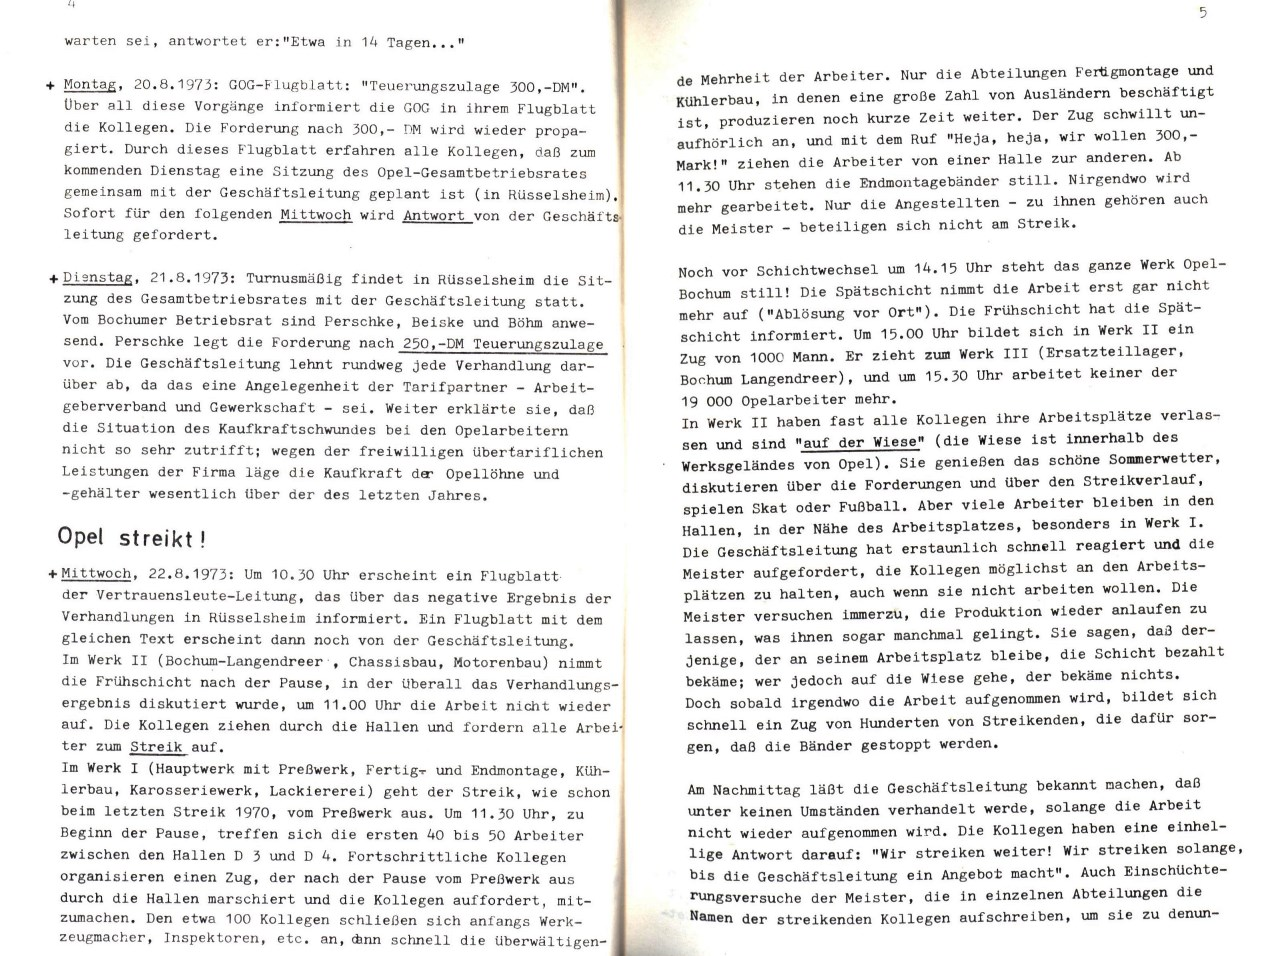 Bochum_IGM_Opel_PG_Opel_streikt_1973_004